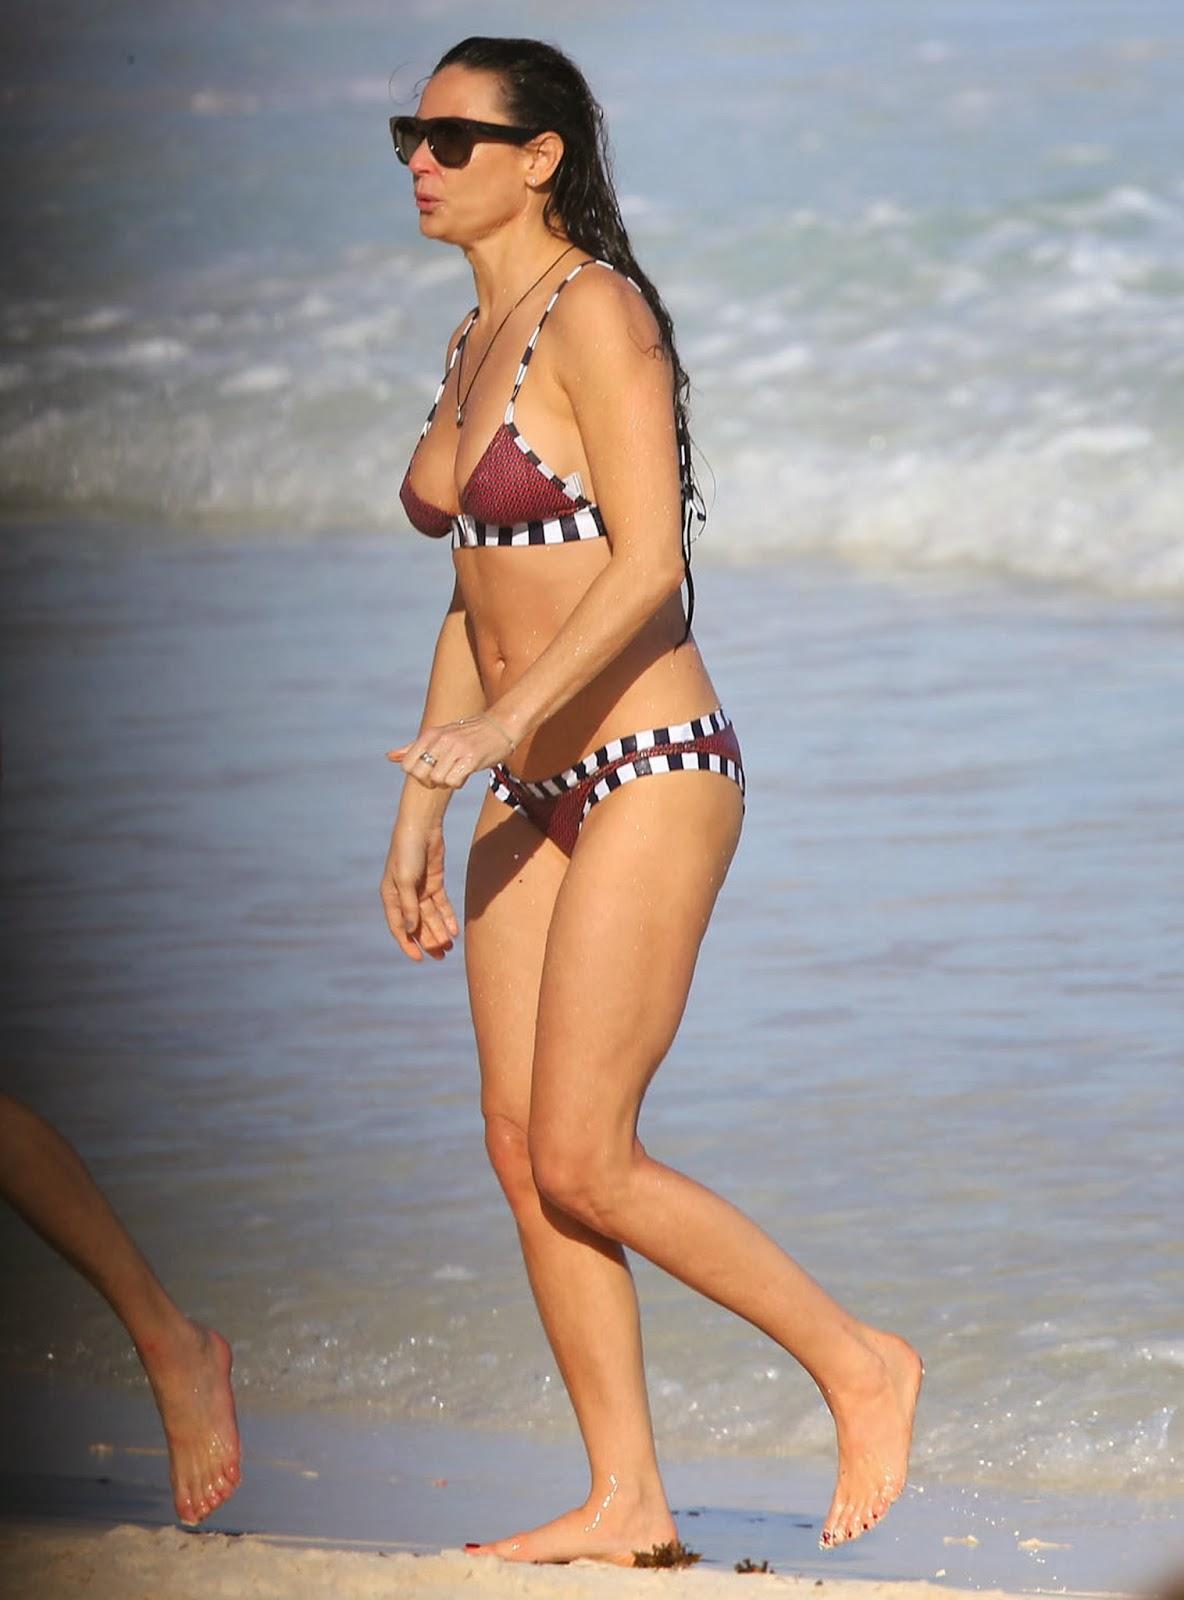 Demi moore bikini tweet